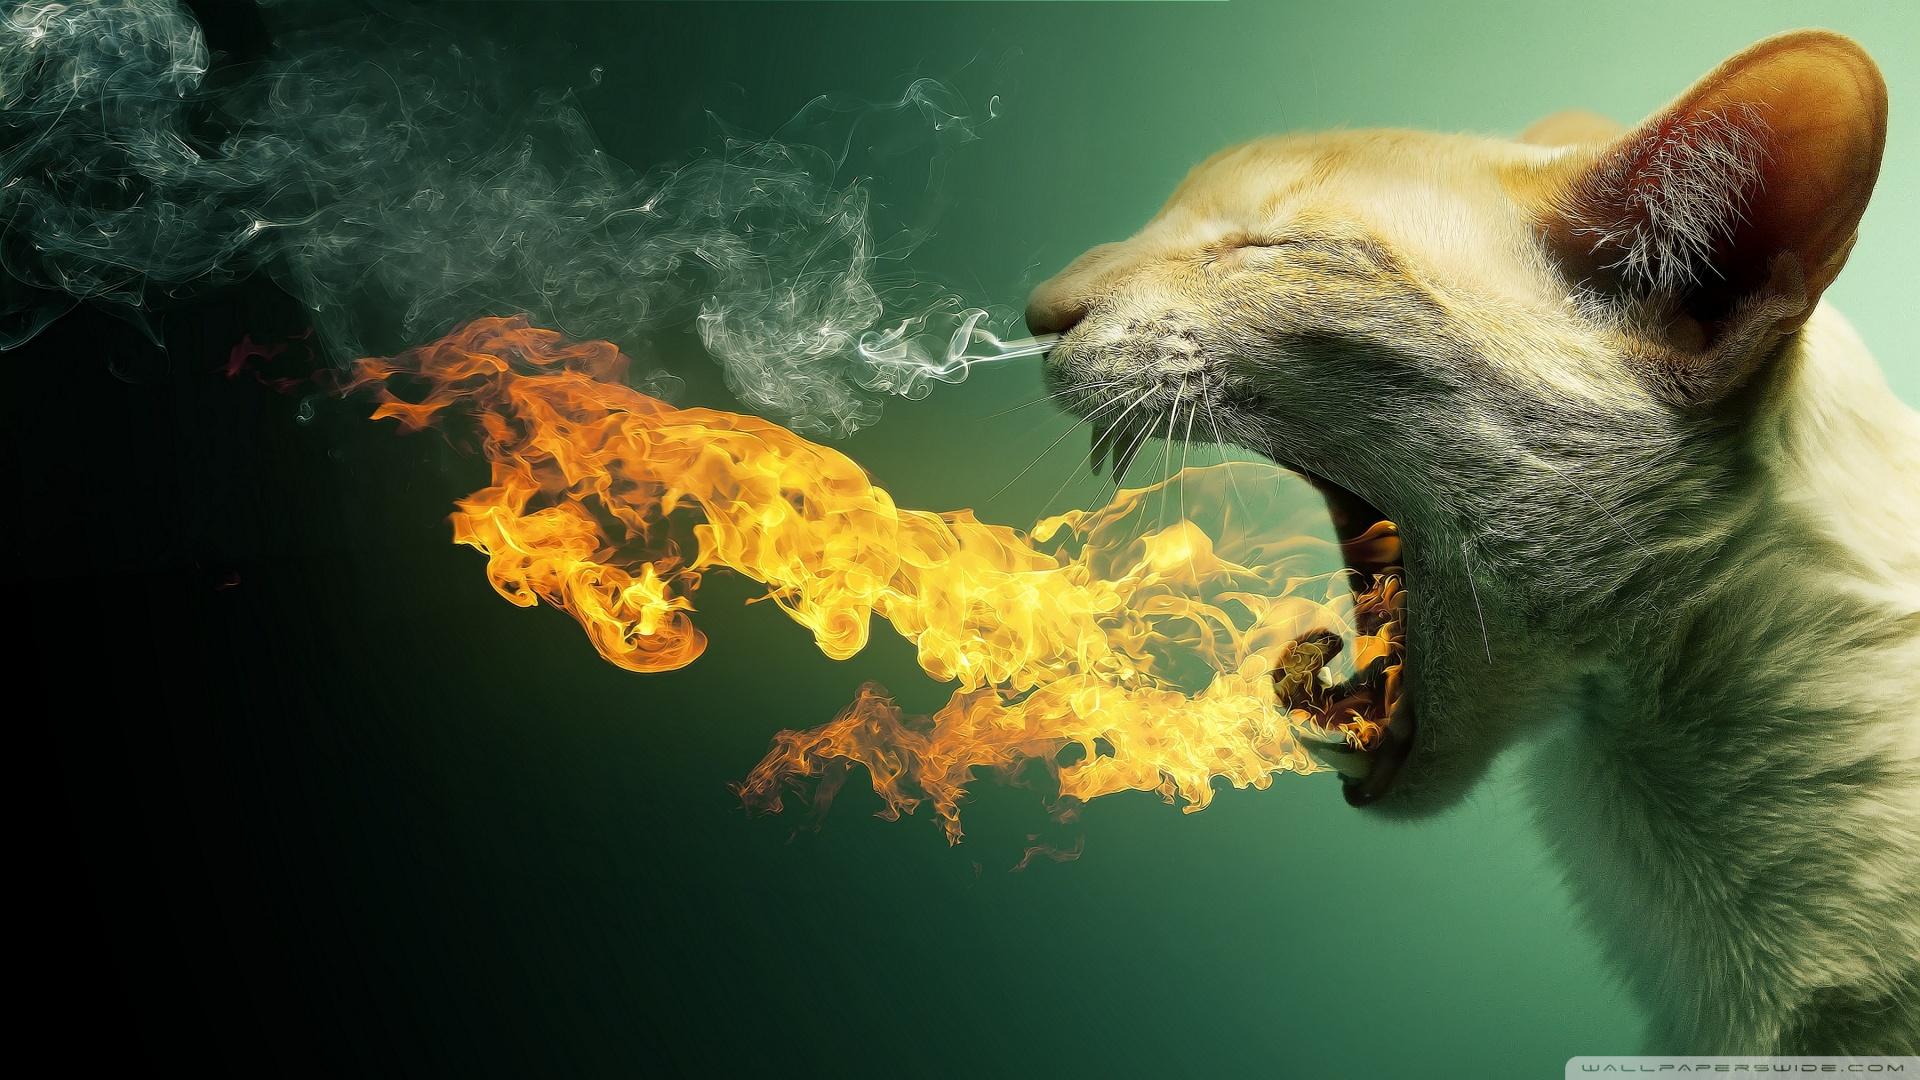 Flaming Cat Wallpaper 1920x1080 Flaming Cat 1920x1080